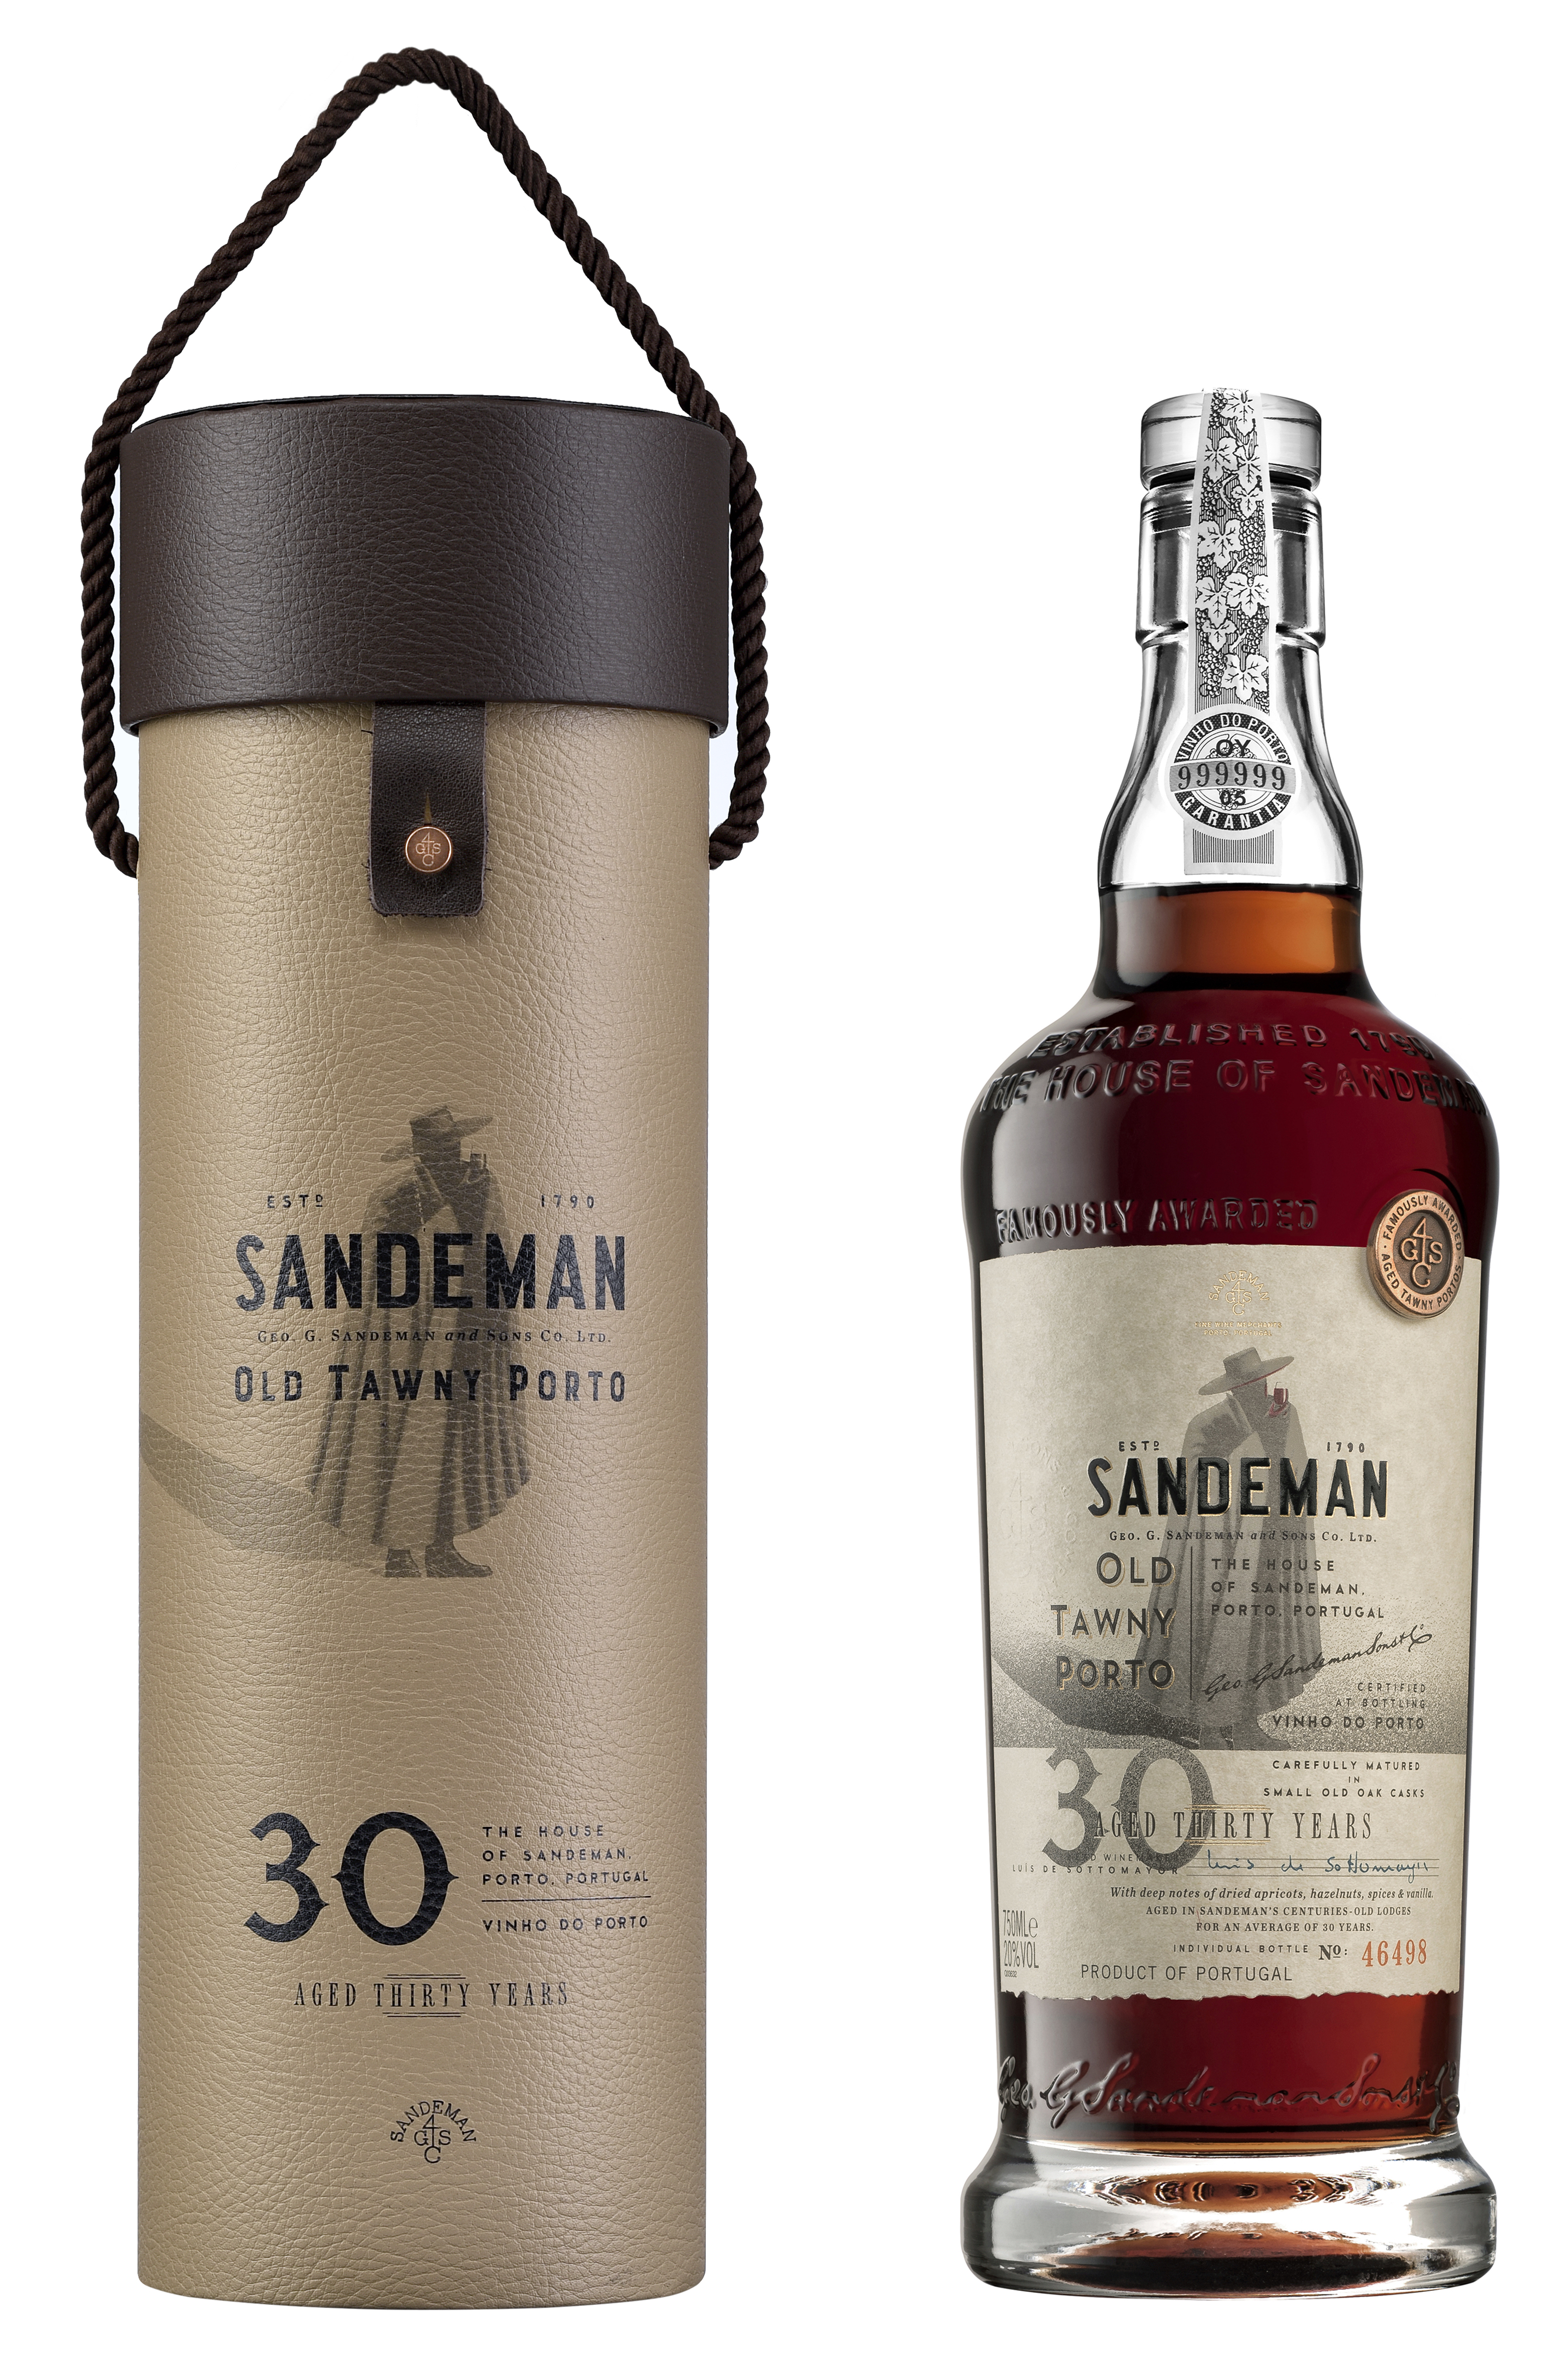 Sandeman, 30 Year Old Tawny Port NV